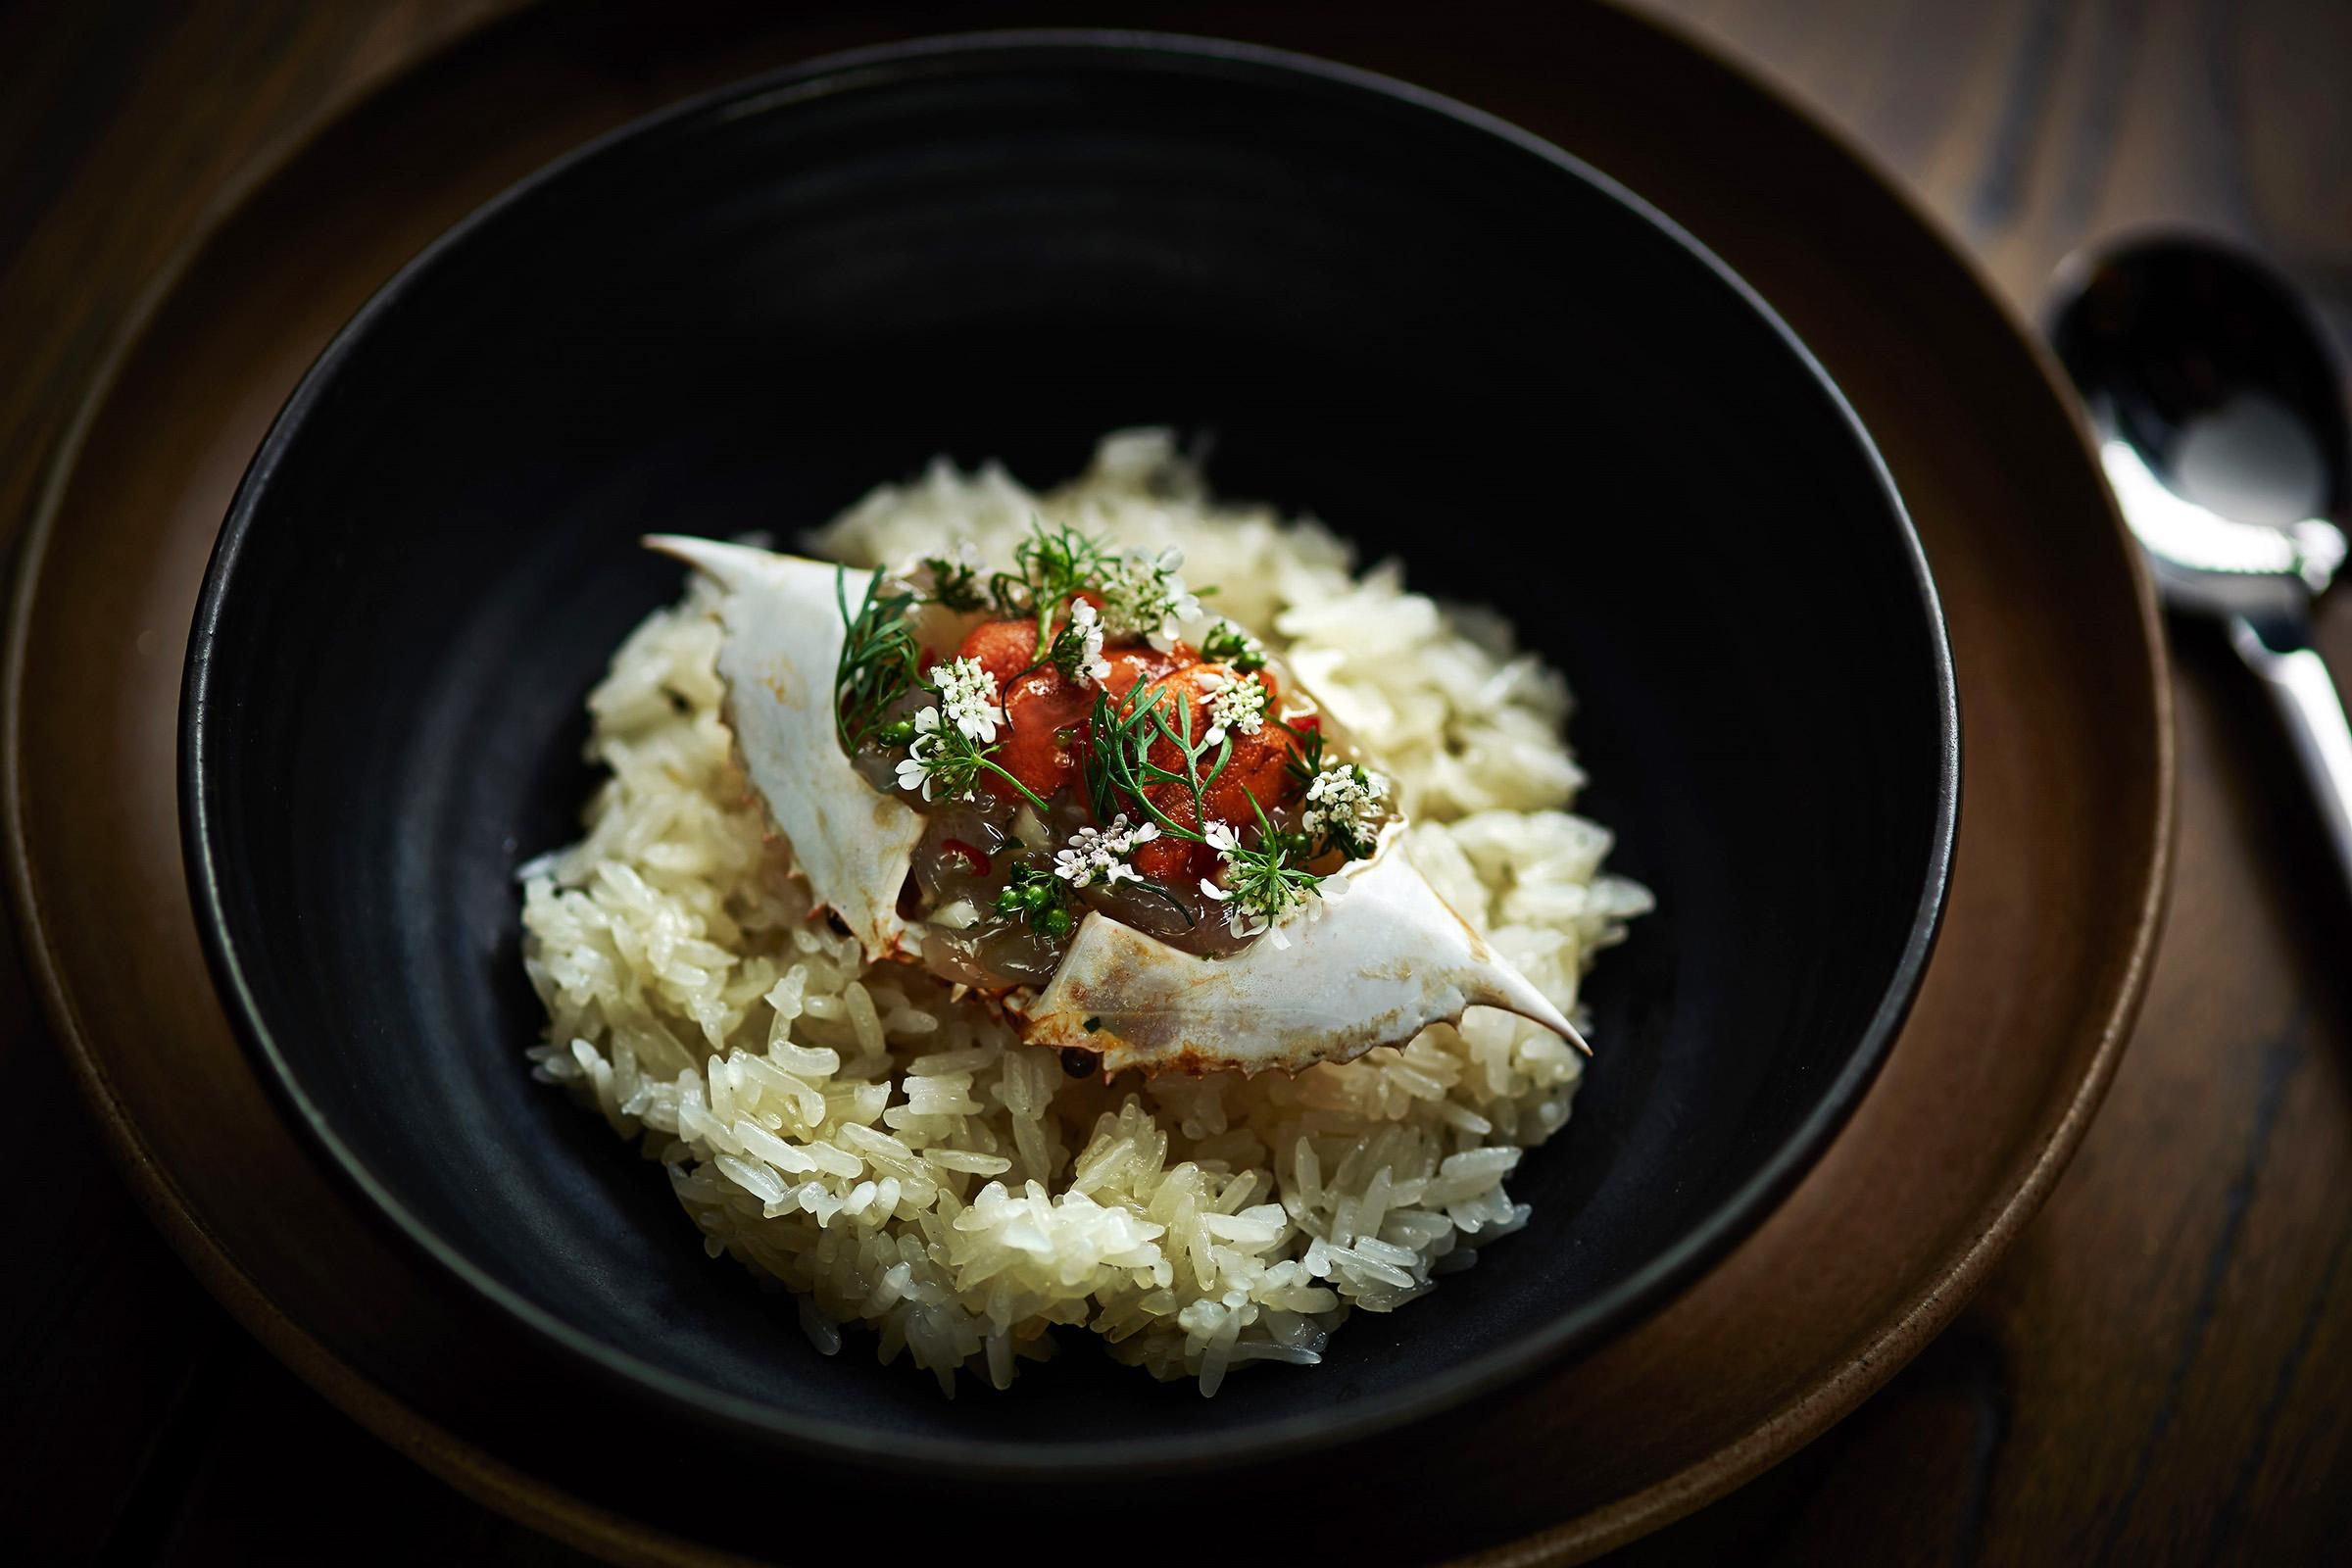 Fish School Hong Kong food sea urchin plate